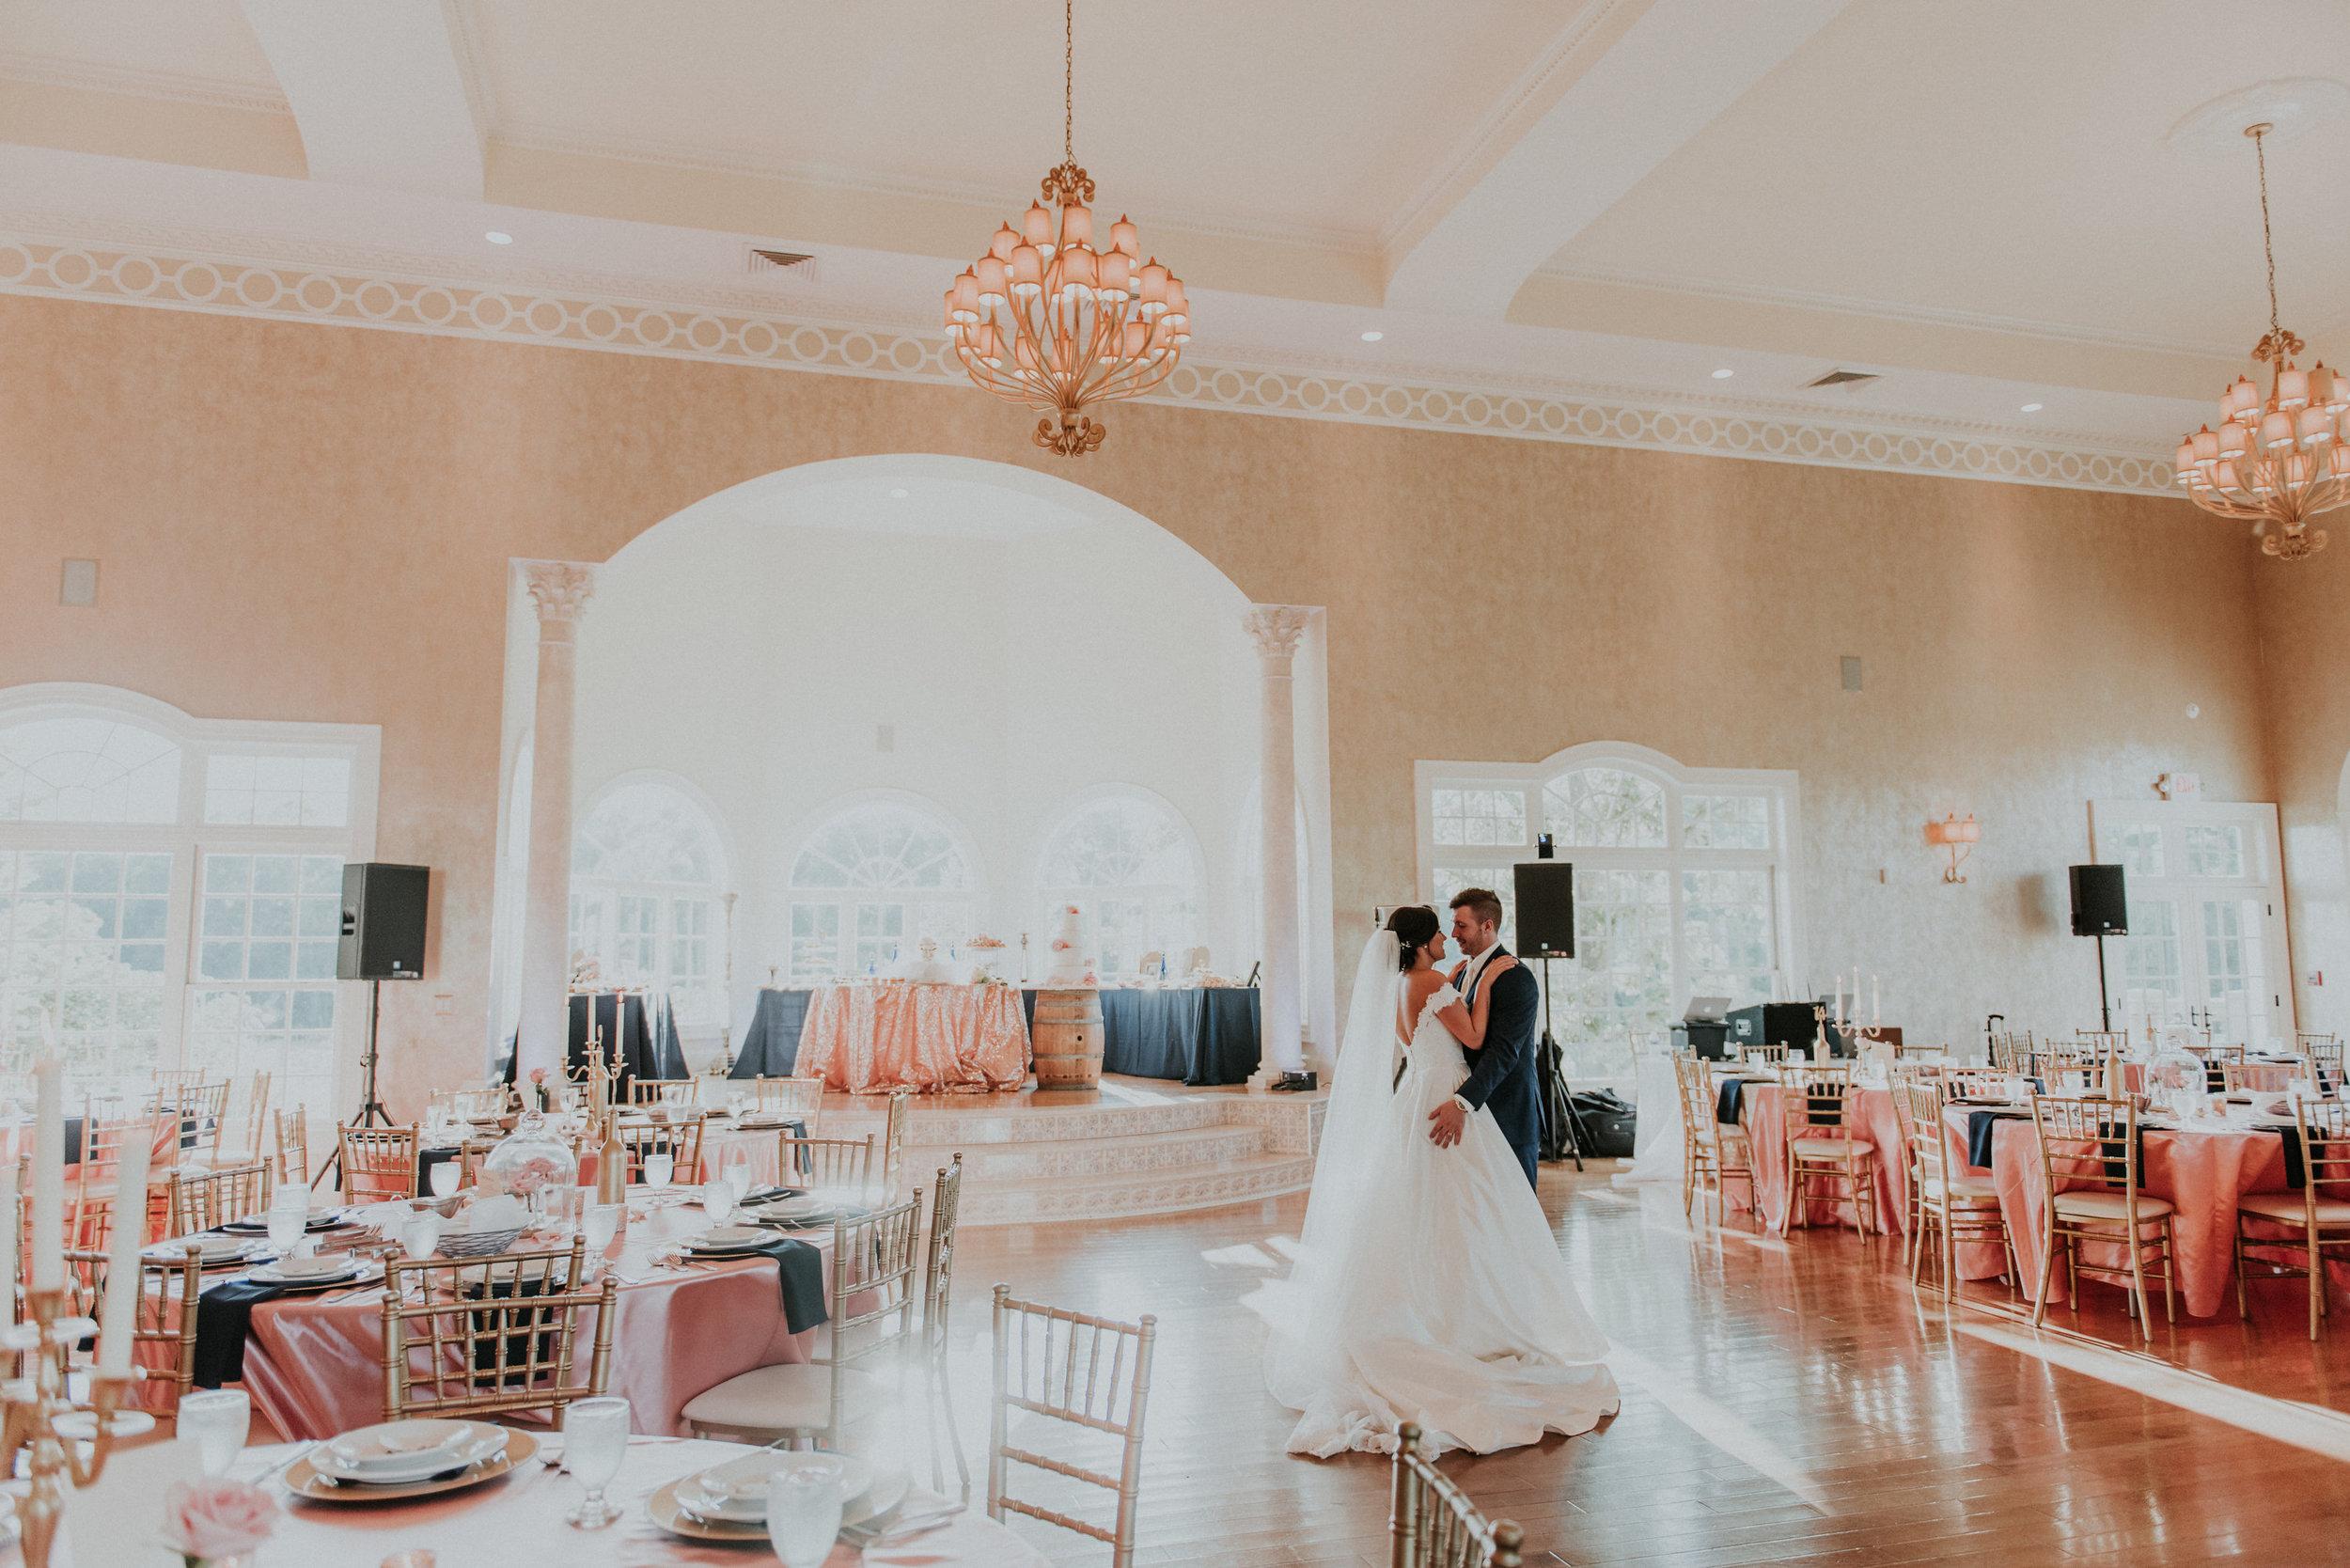 morais-wedding-virginia-wedding-planner-virginia-wedding-coordinator-leah-adkins-photography-beauty-and-the-beast